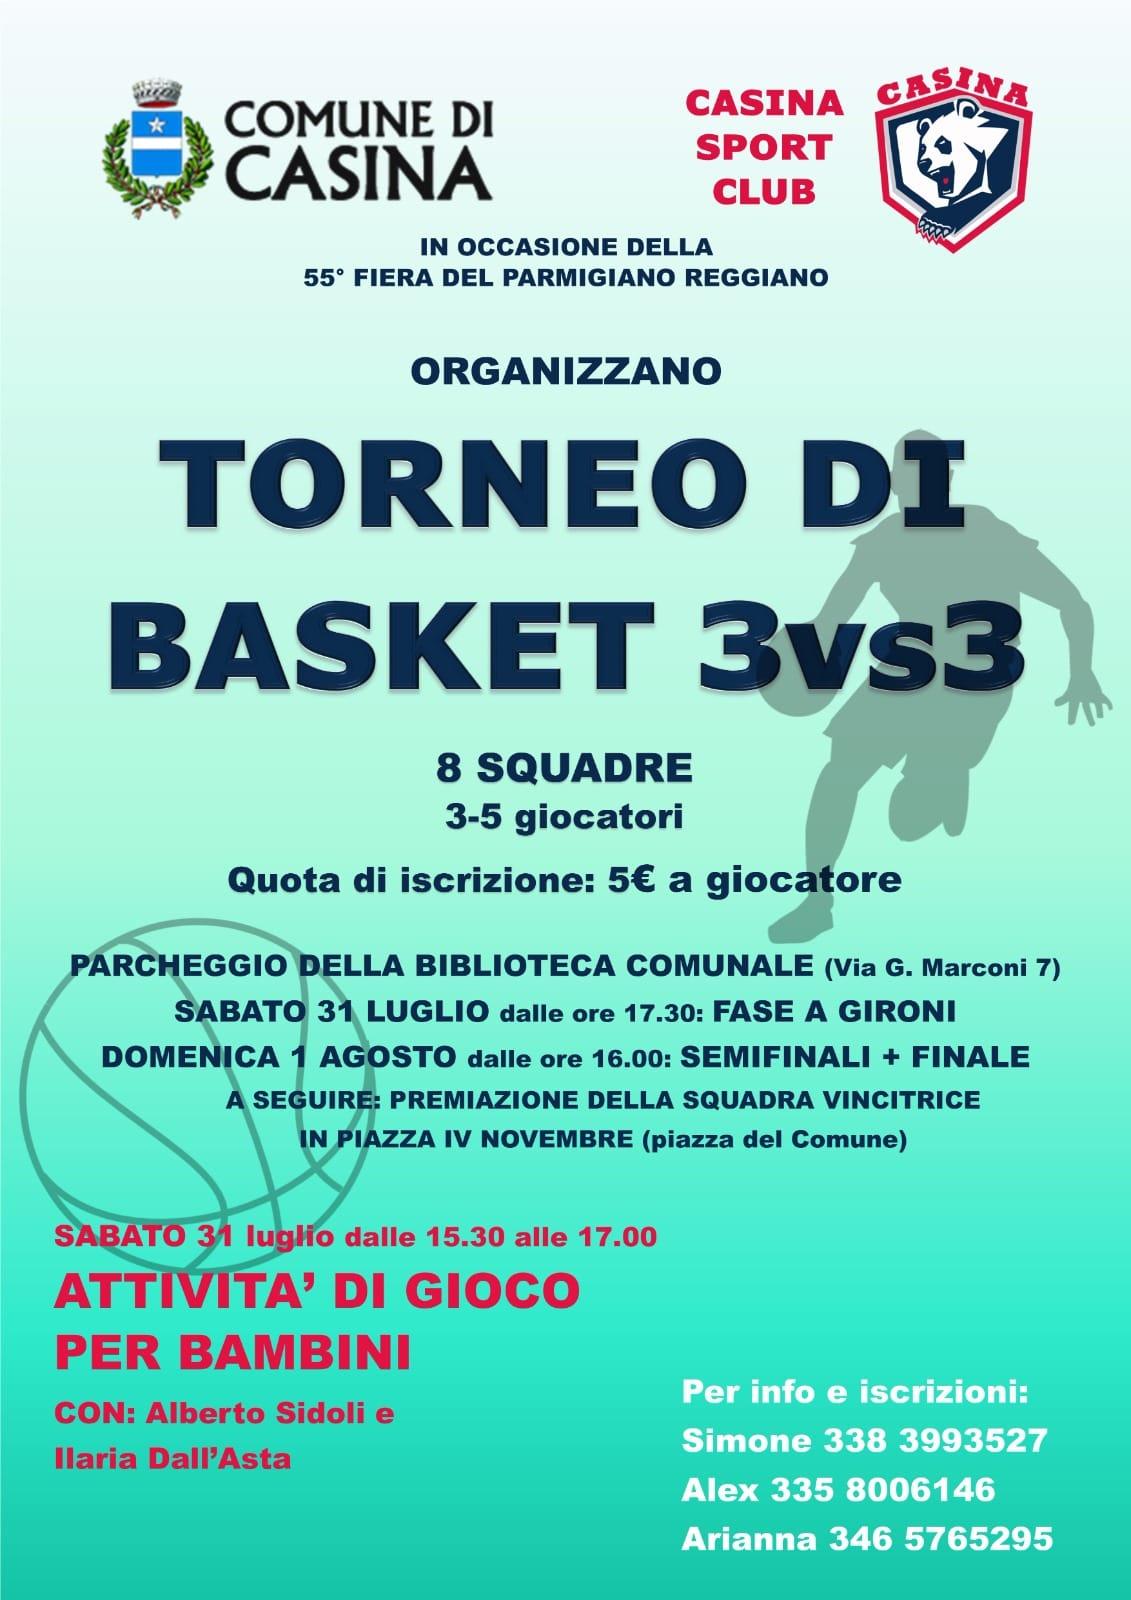 Torneo di basket 3vs3